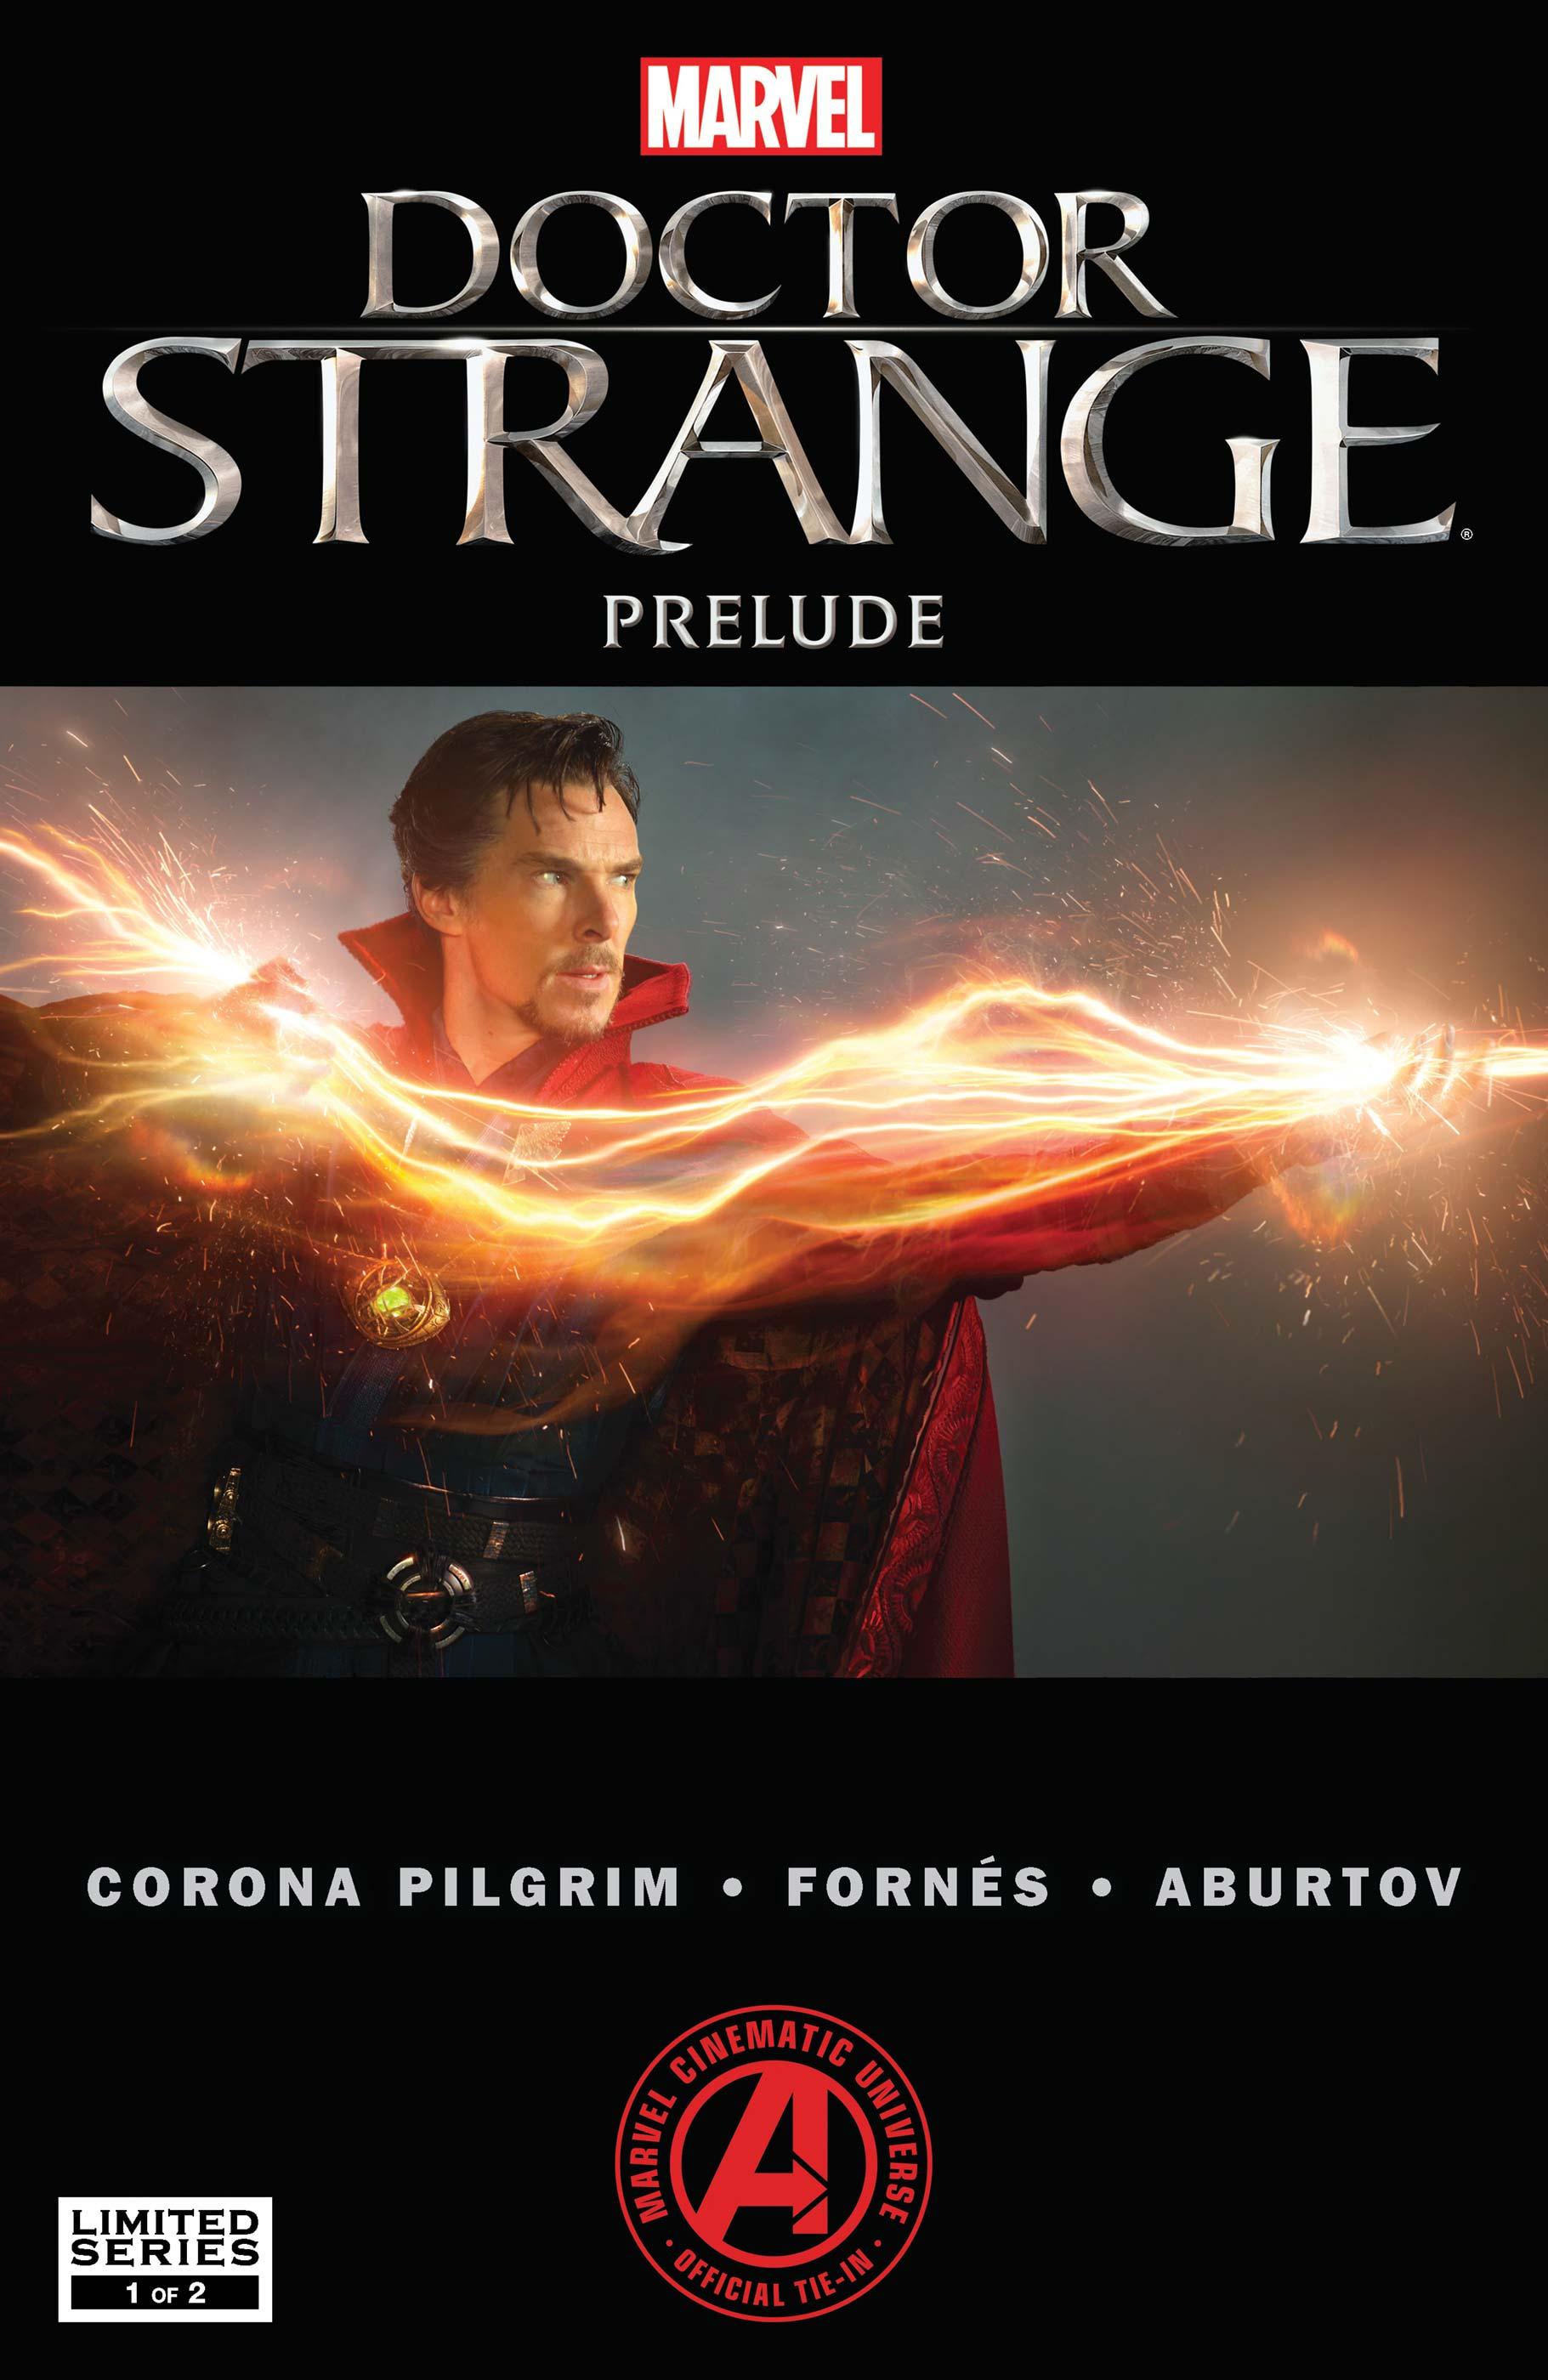 Marvel's Doctor Strange Prelude (2016) #1